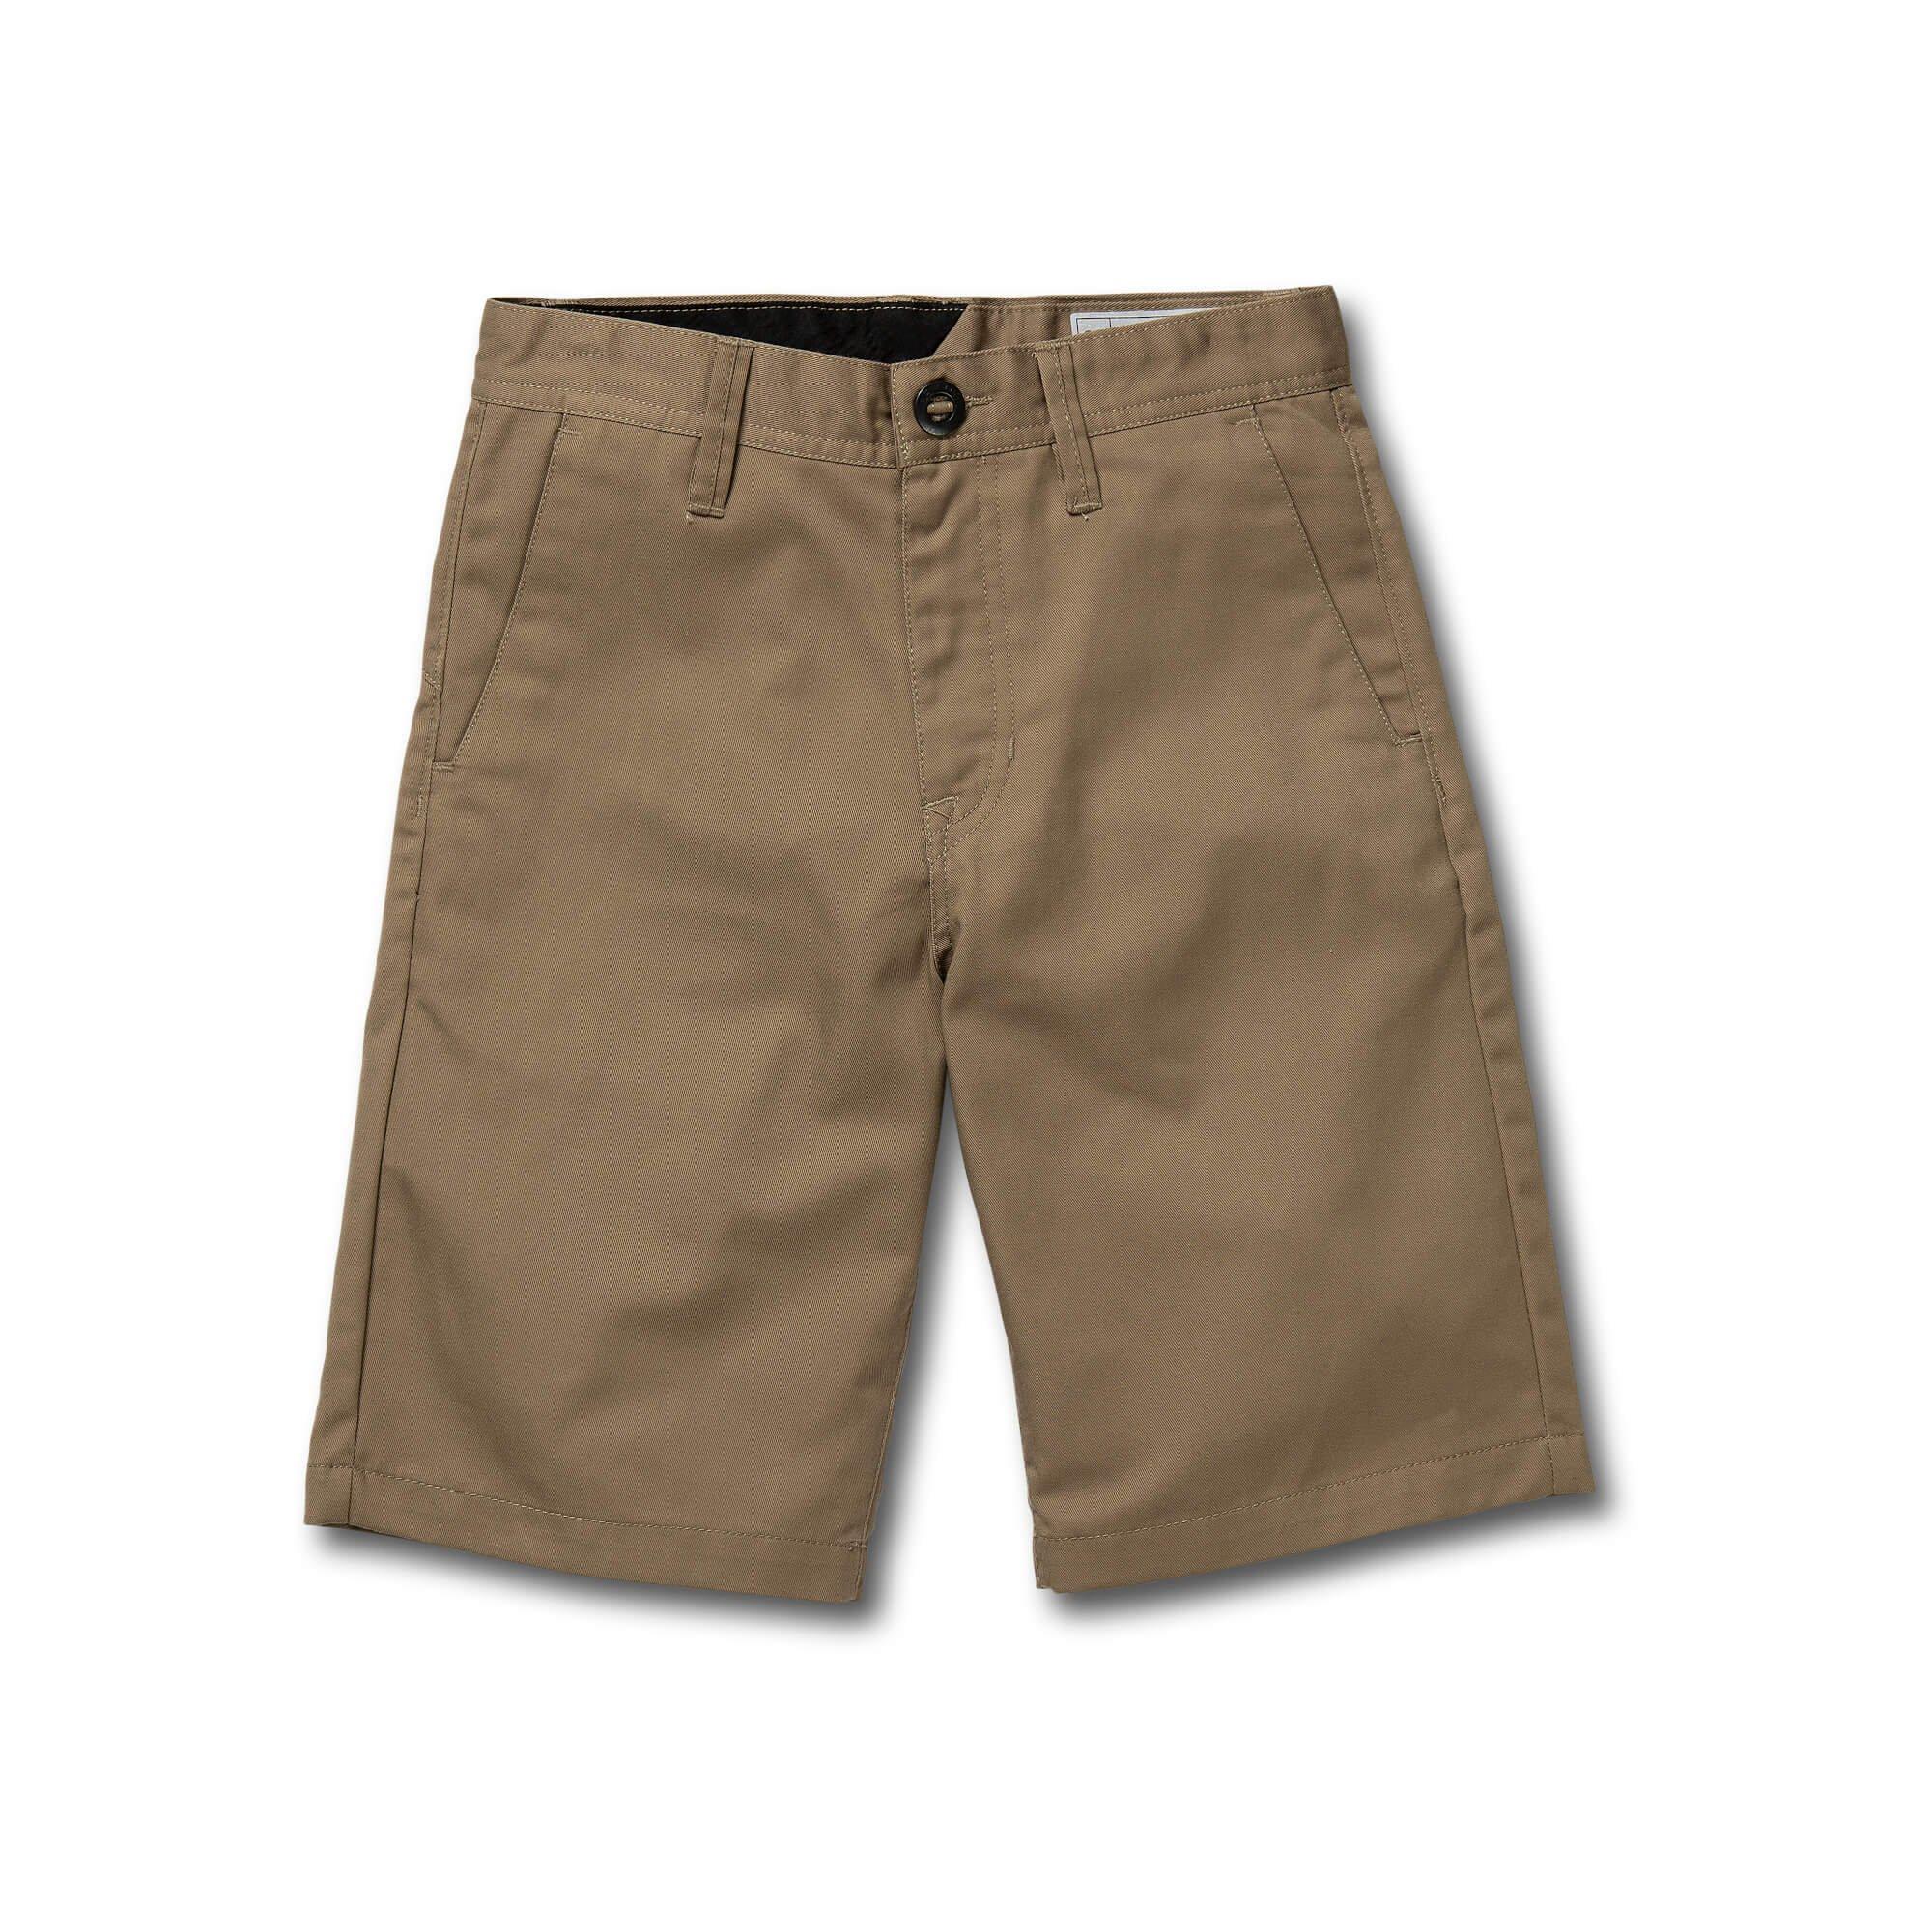 Volcom Big Boys Frickin Chino Short, Khaki, 29 by Volcom